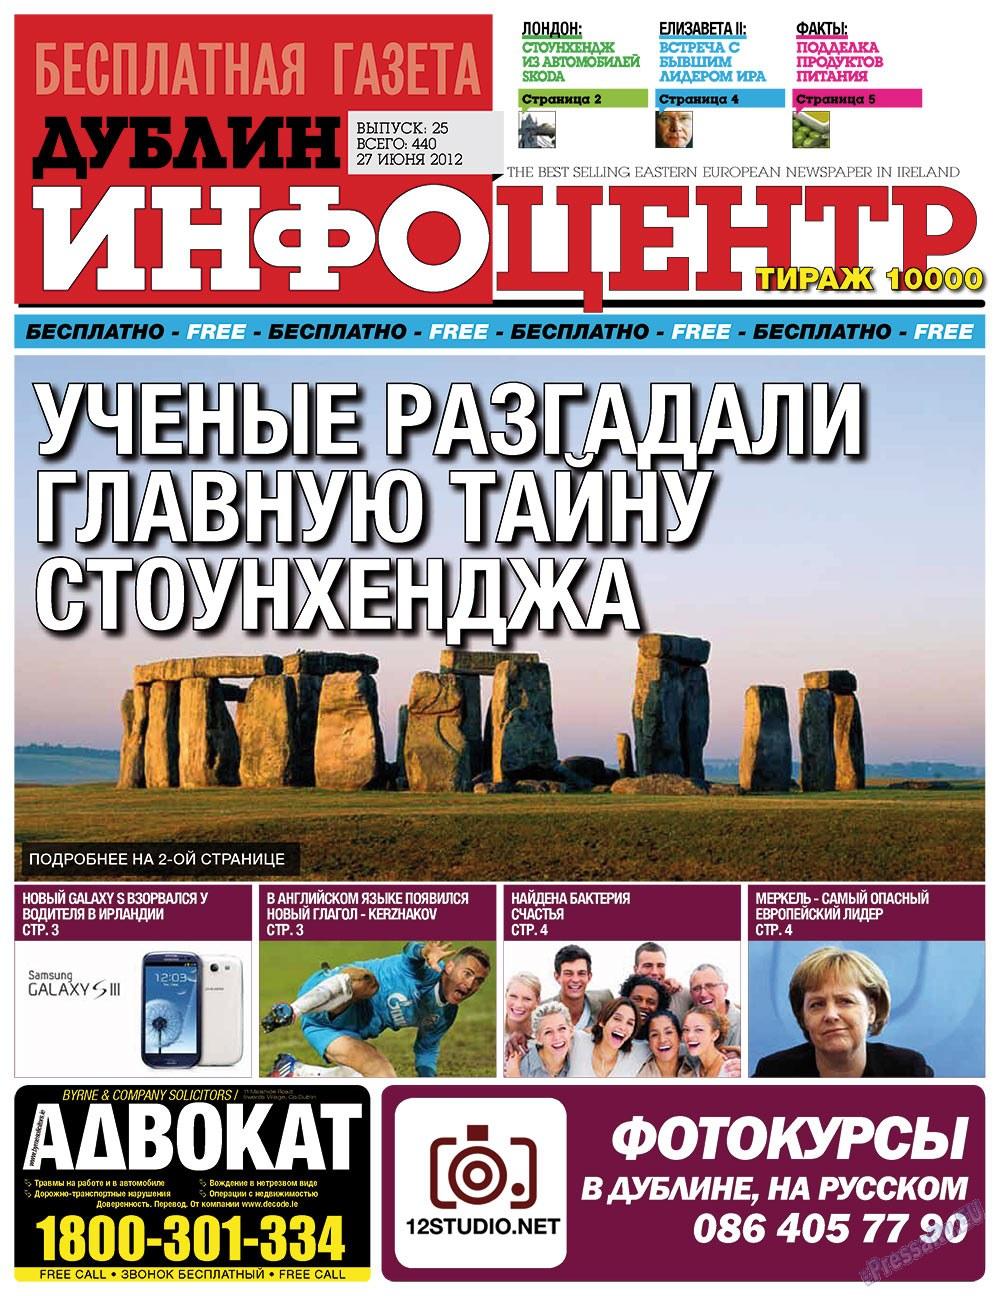 Дублин инфоцентр (газета). 2012 год, номер 25, стр. 1